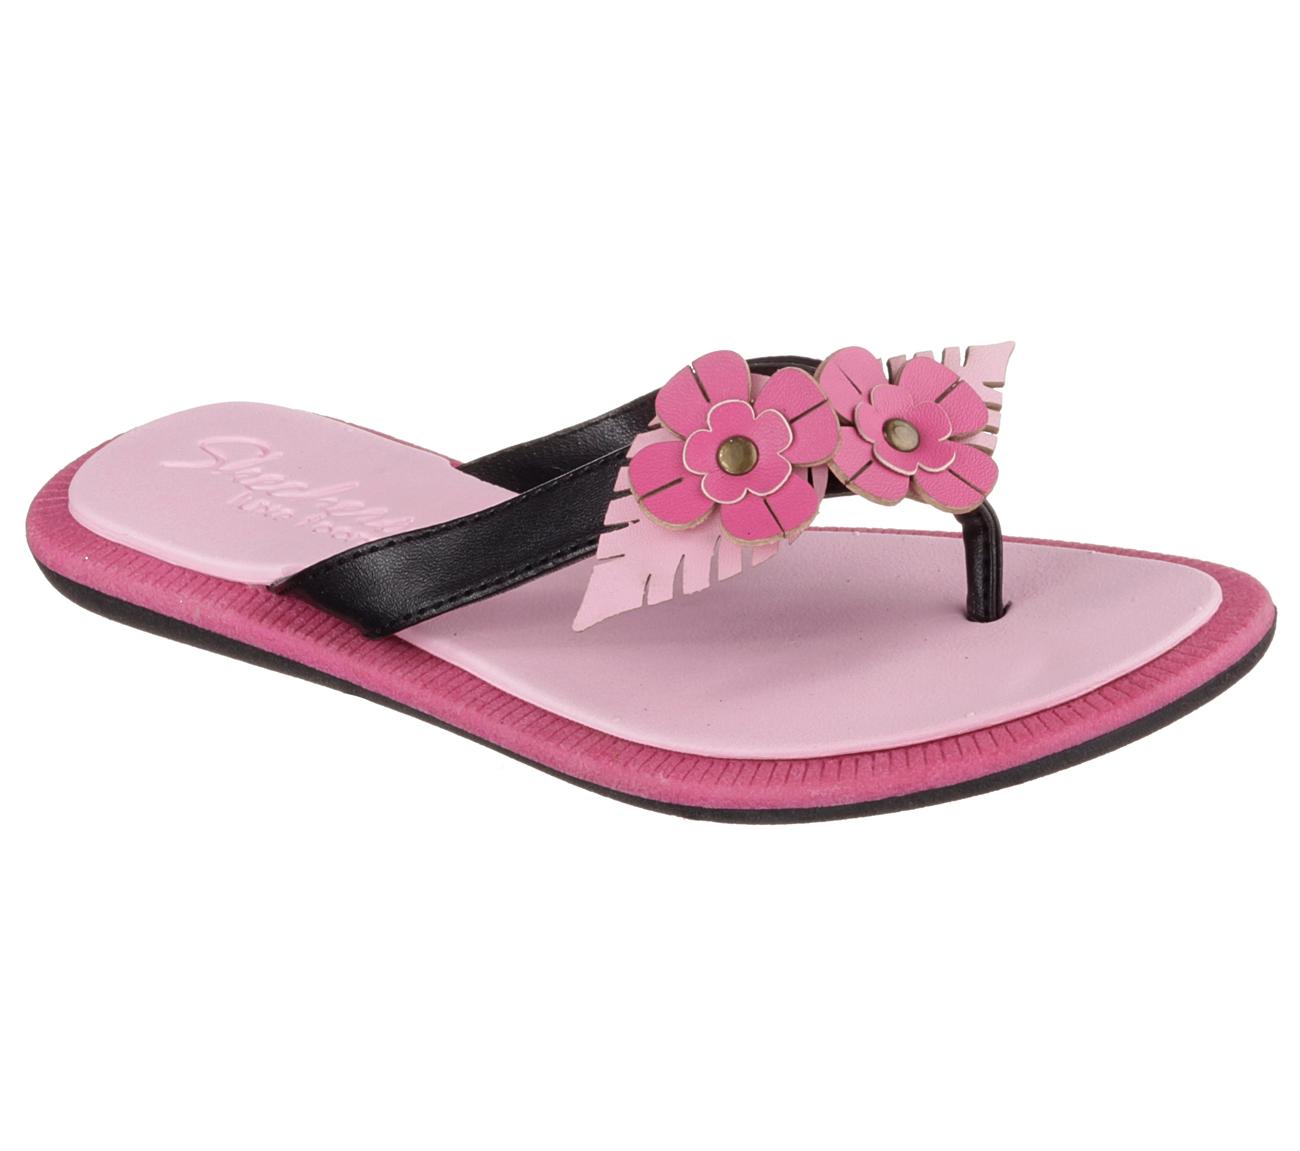 Shiny Black Bobs Shoes